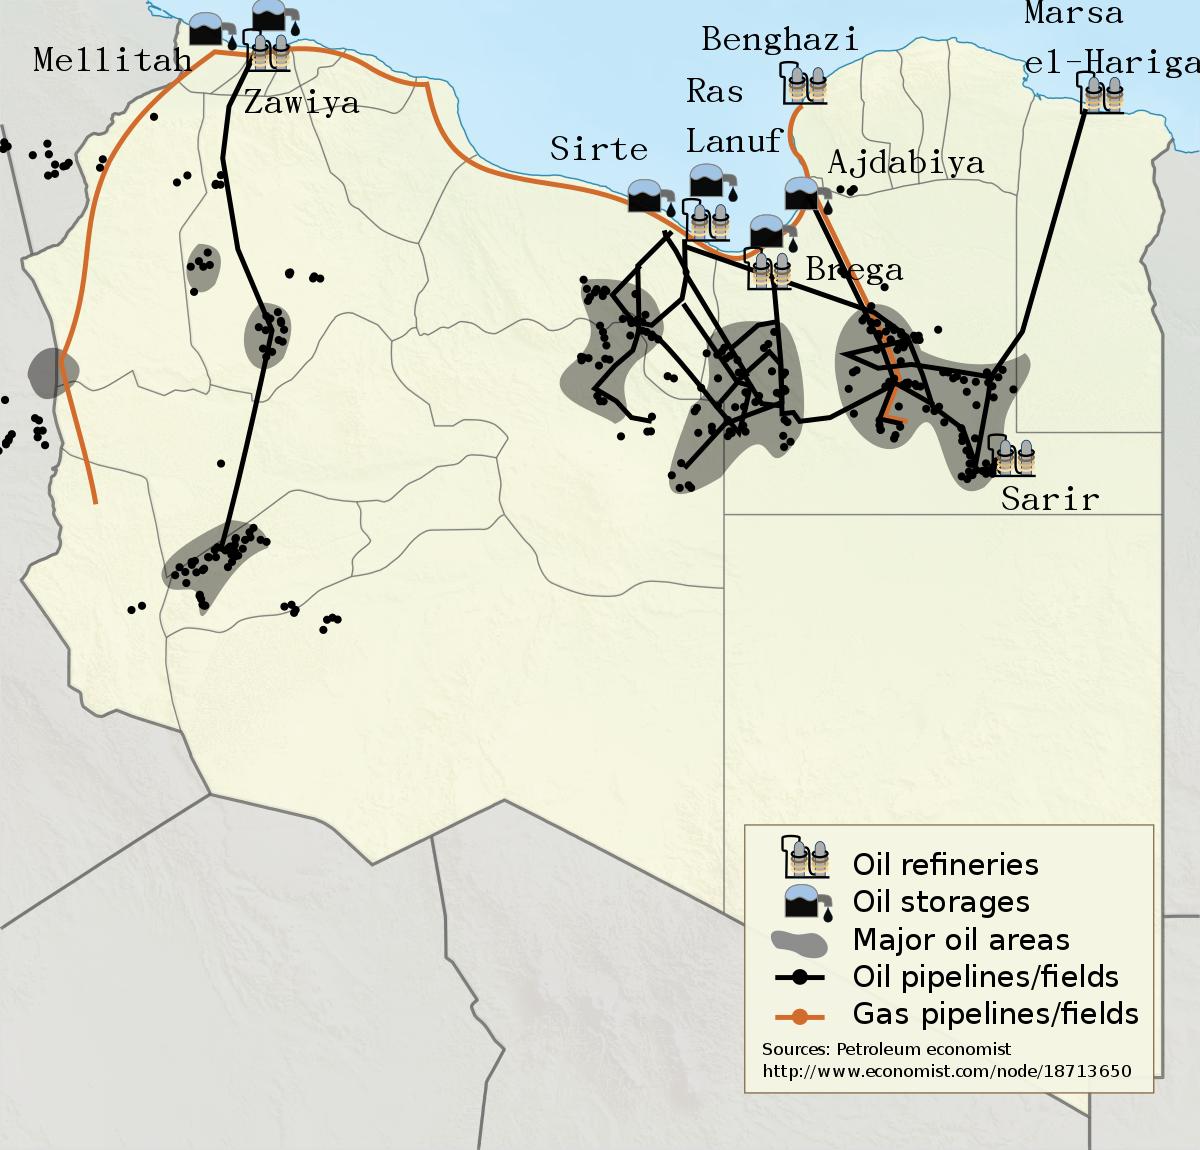 https://upload.wikimedia.org/wikipedia/commons/thumb/f/f4/Libya_location_map-oil_%26_gas_2011-en.svg/1200px-Libya_location_map-oil_%26_gas_2011-en.svg.png